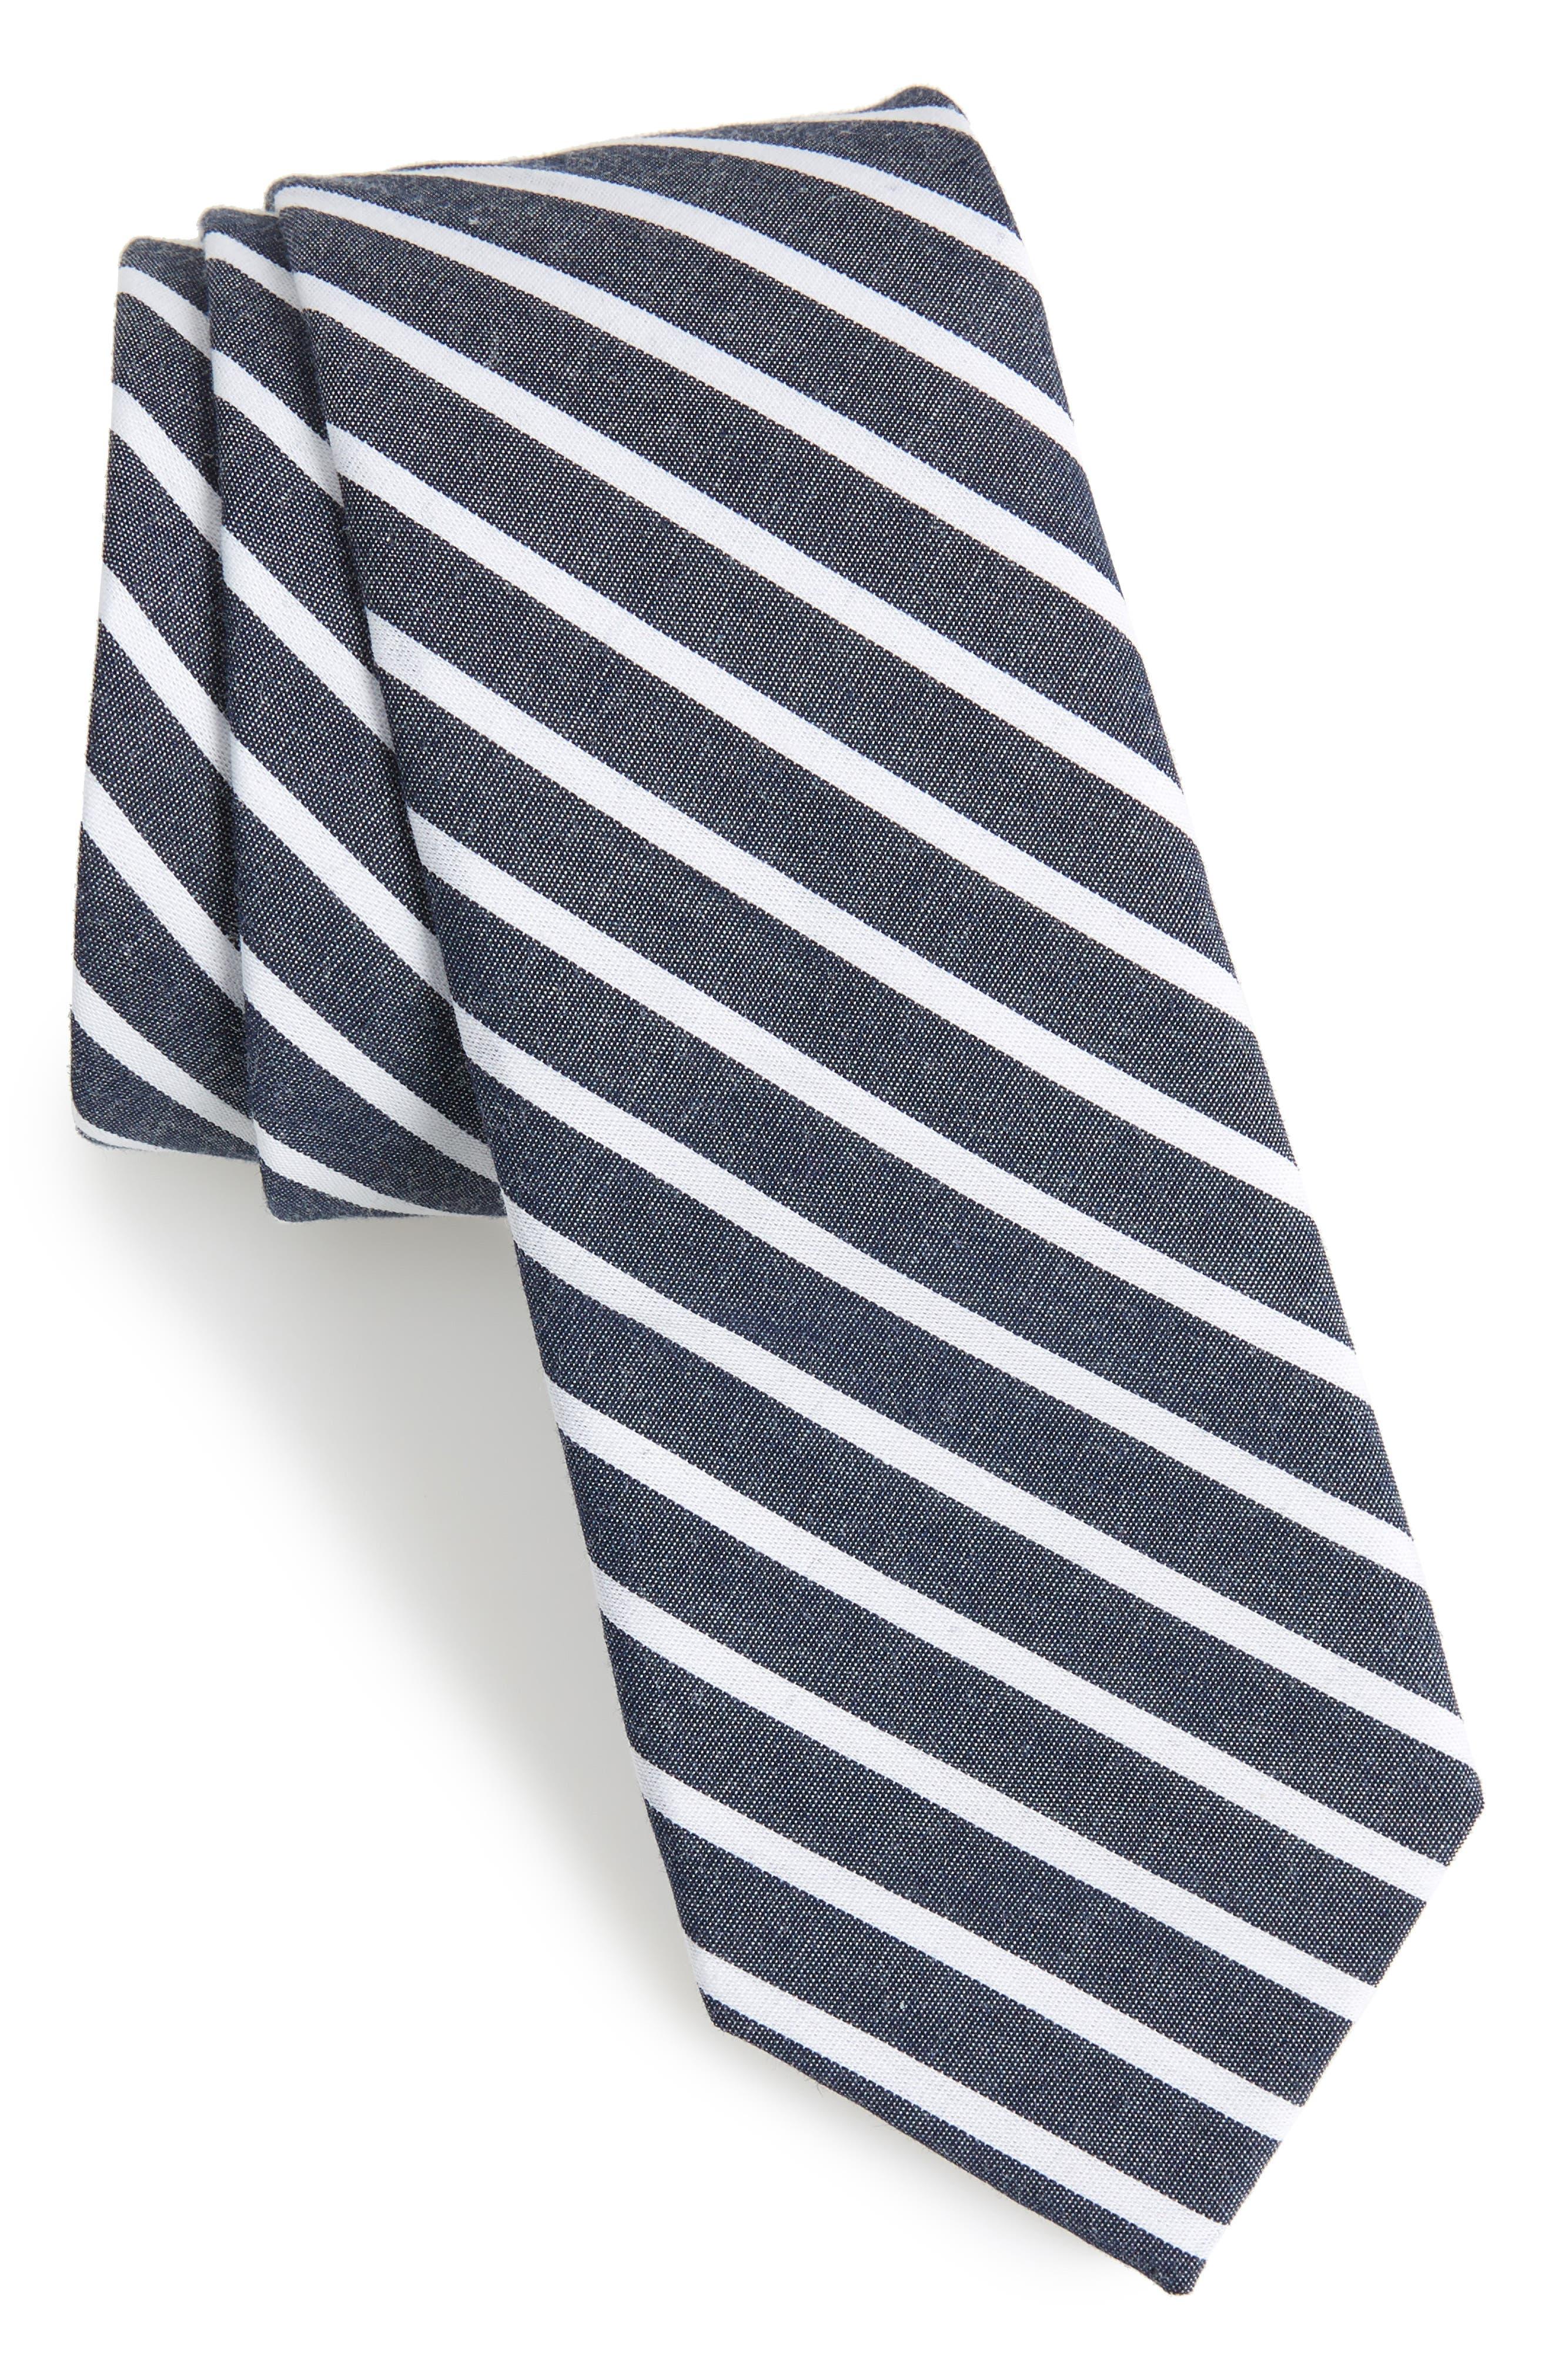 Holborn Stripe Cotton Skinny Tie,                         Main,                         color, 410